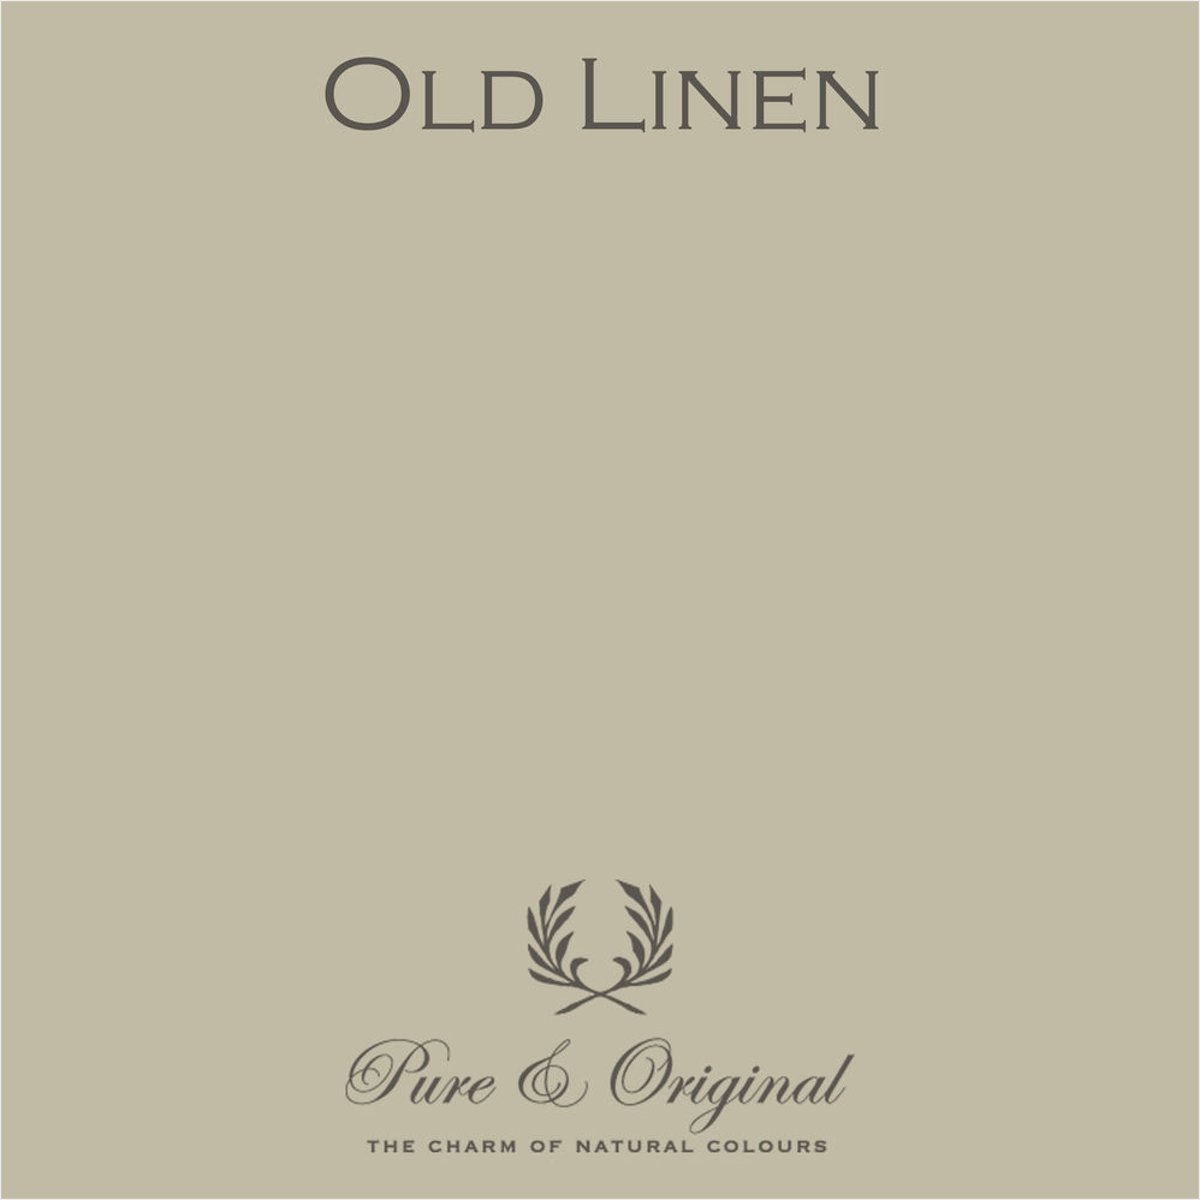 Pure & Original Classico Regular Old Linen 2.5 L